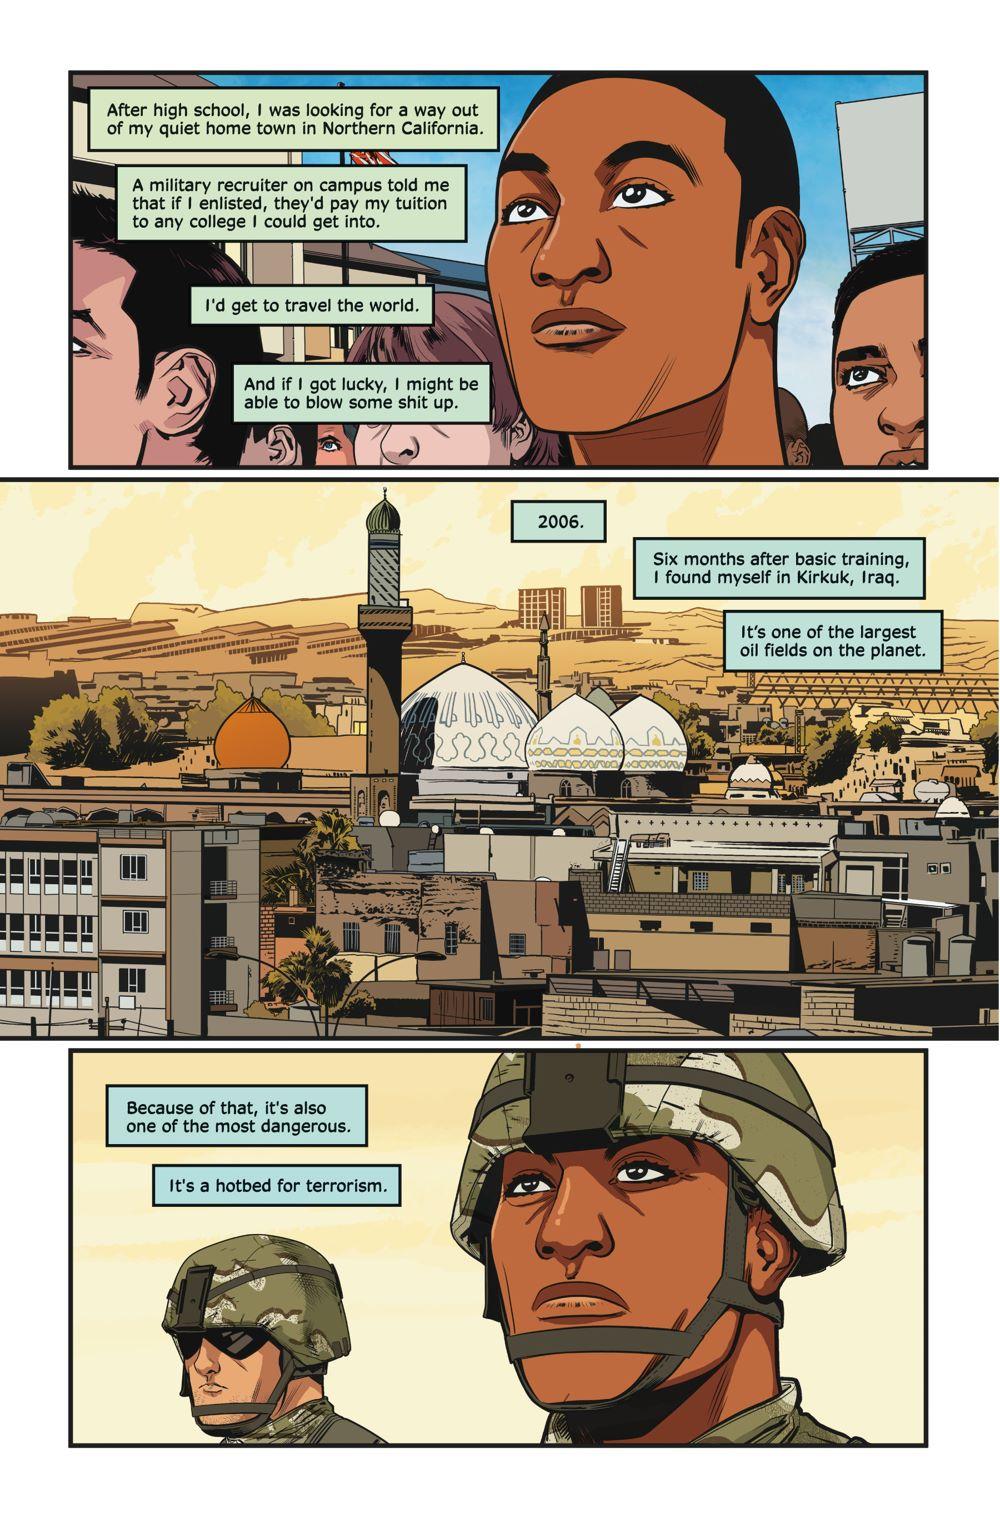 e102e001-e32a-4f24-9d30-10e546525020 TRUE WAR STORIES to debut in comic shops on November 25